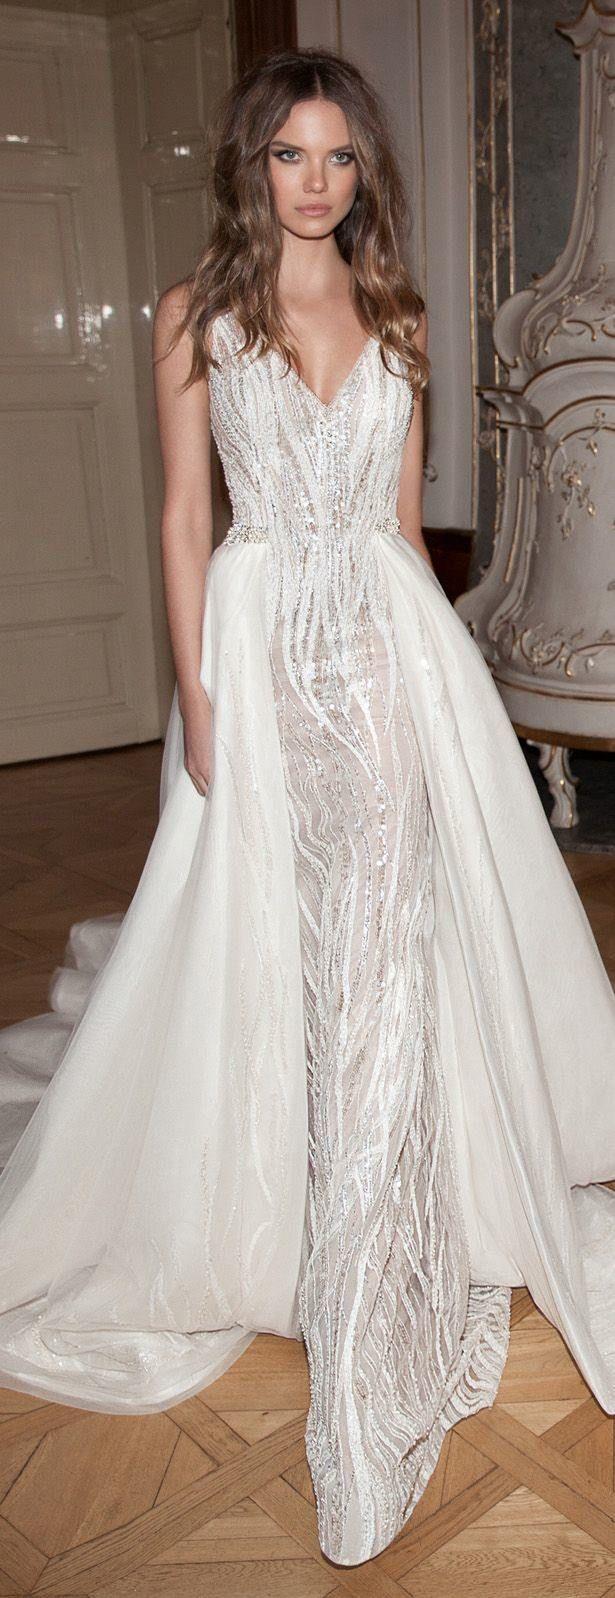 Editor's Picks 22 Amazing HandBeaded Wedding Dresses